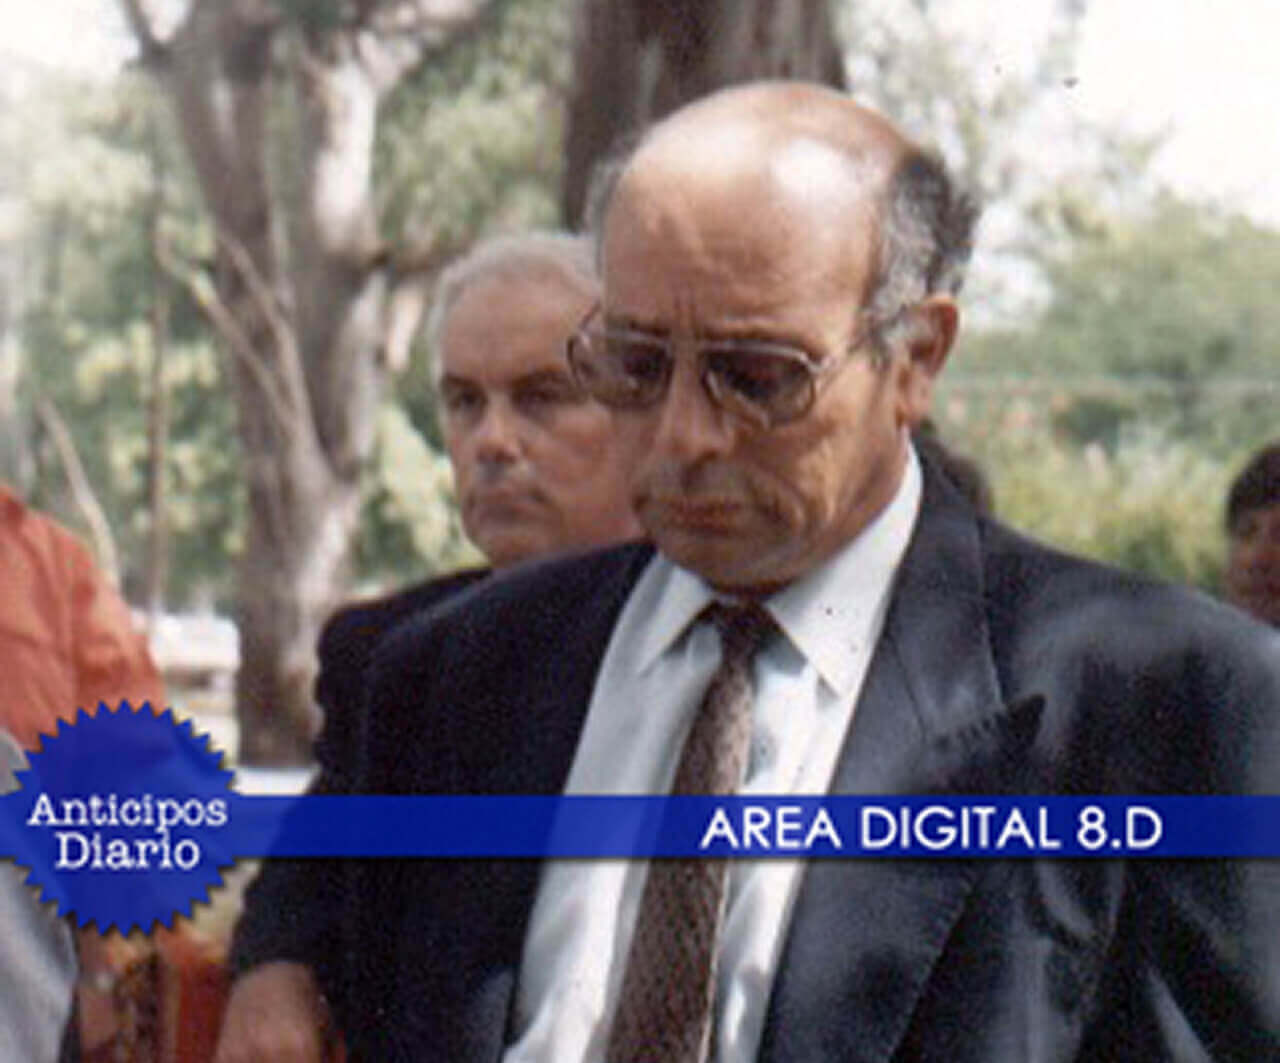 Falleció el histórico dirigente peronista César Acosta